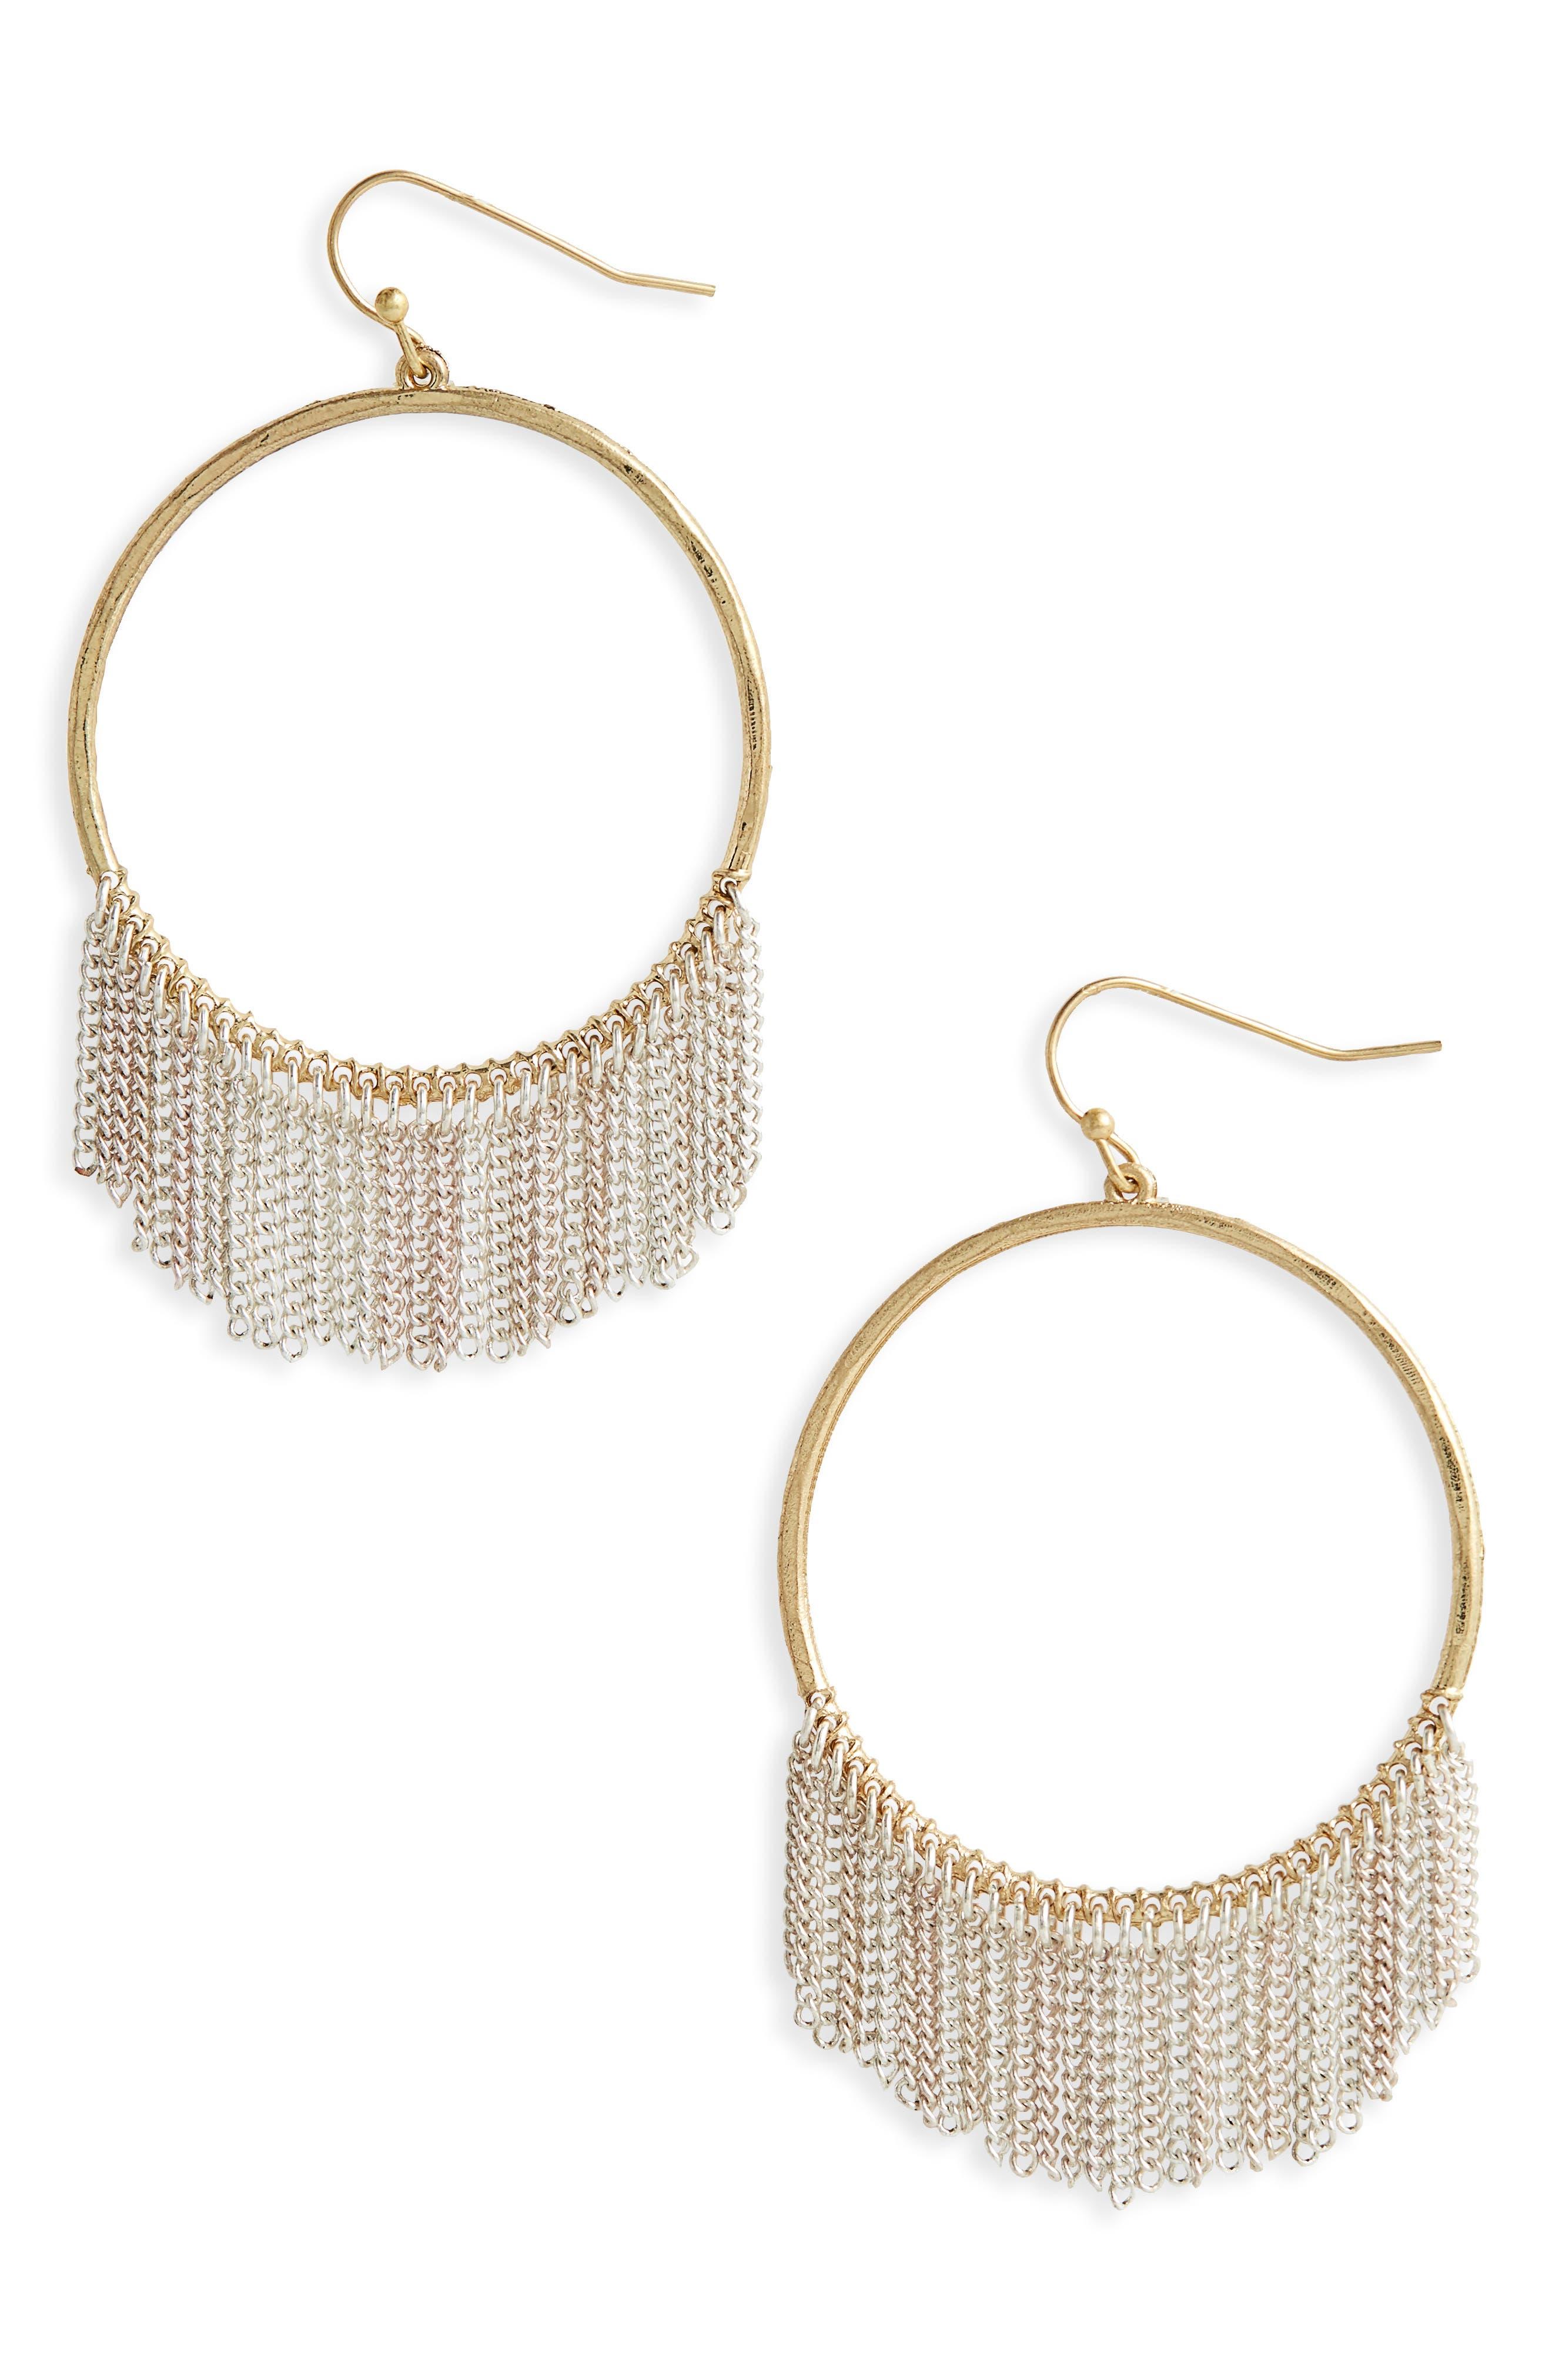 Tassel Hoop Earrings,                             Main thumbnail 1, color,                             Gold